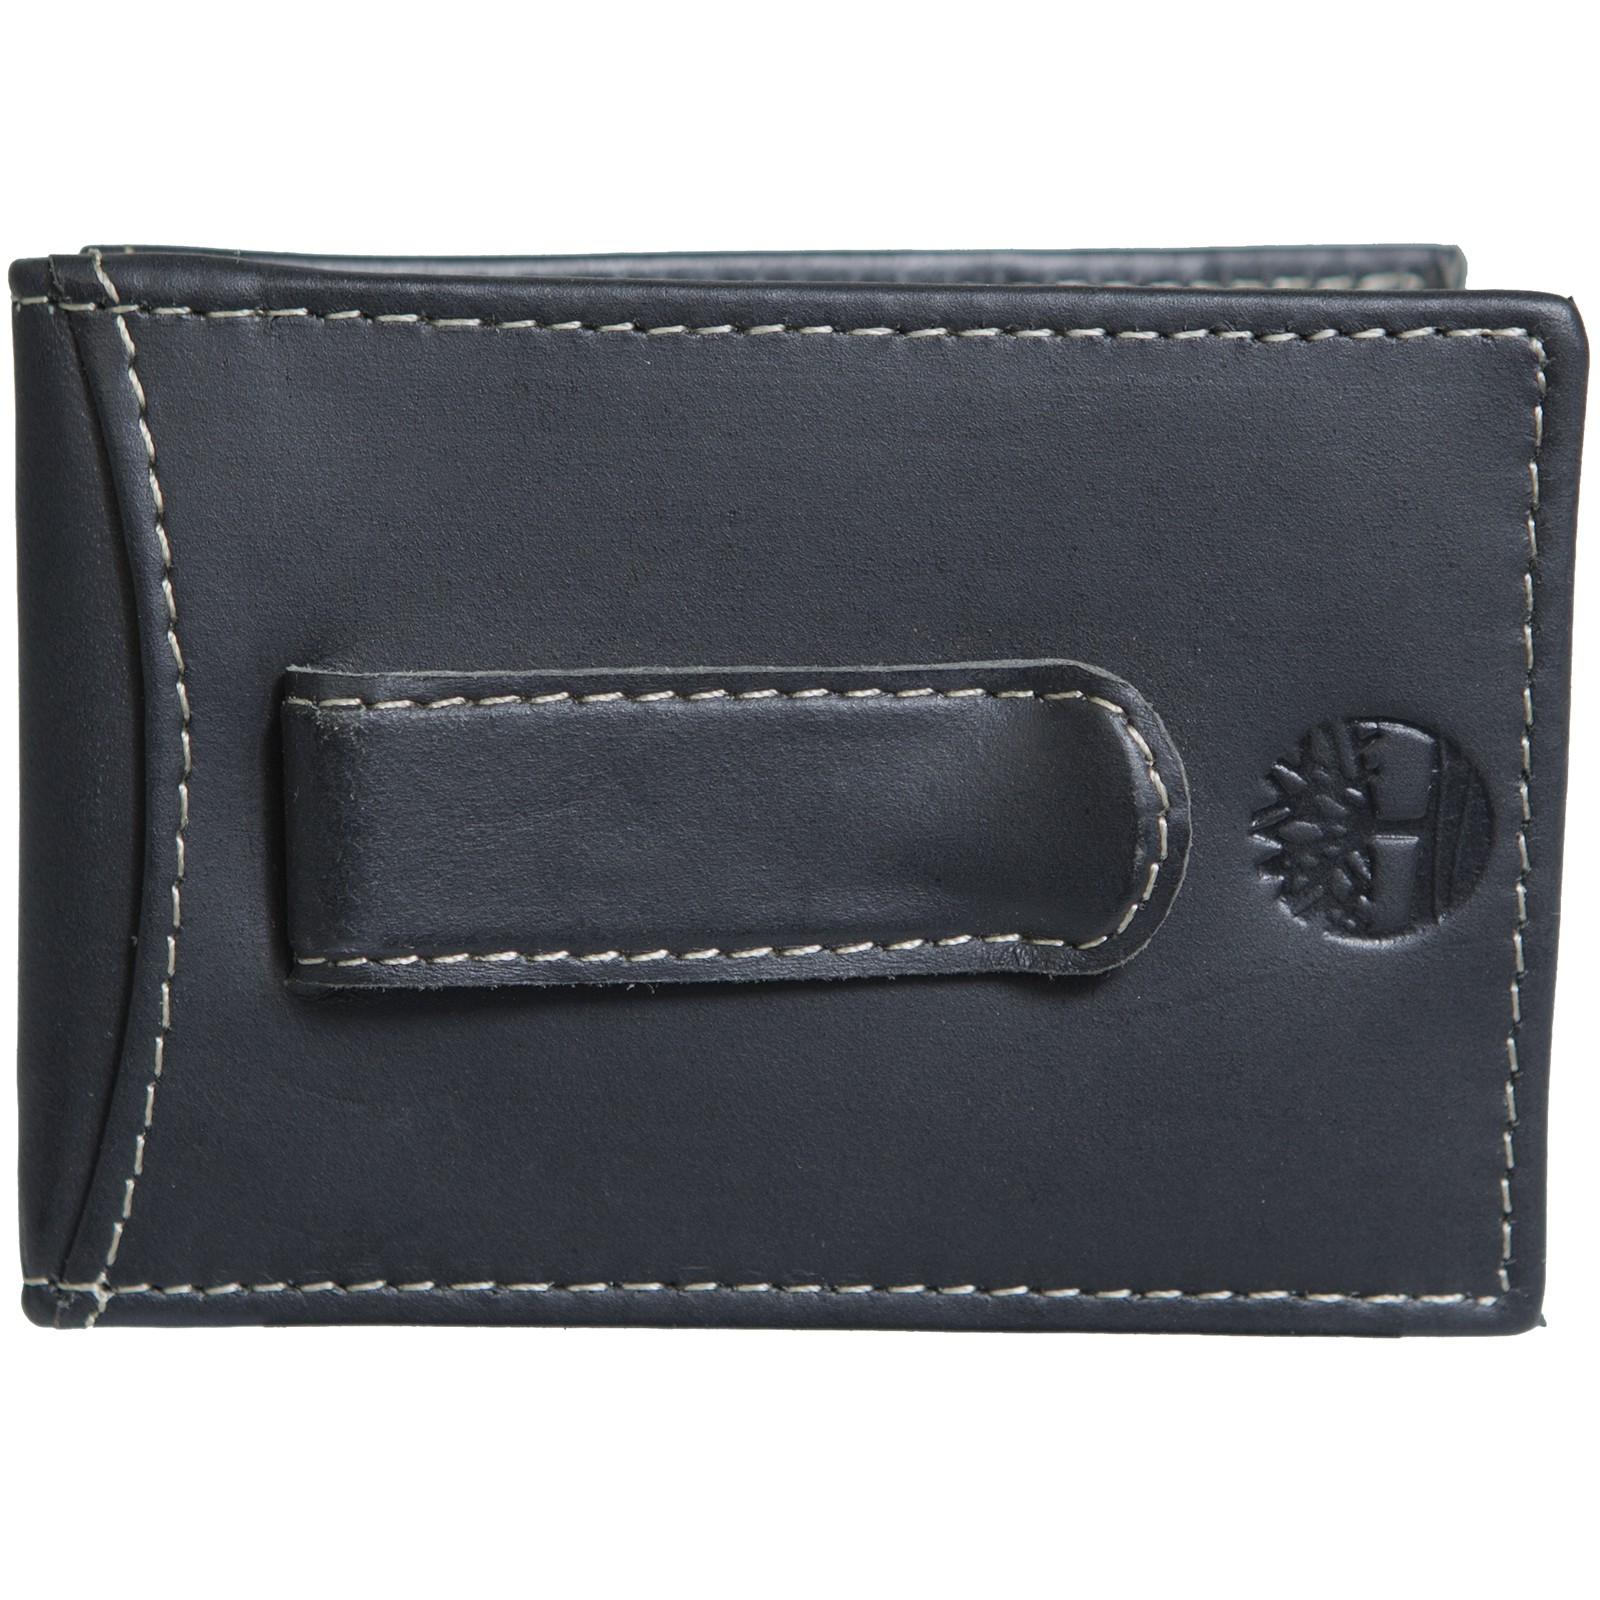 85196ffa7b5f0 Timberland Mens Flip Money Clip Leather Bifold Pocket Wallet ID Card Case  Holder